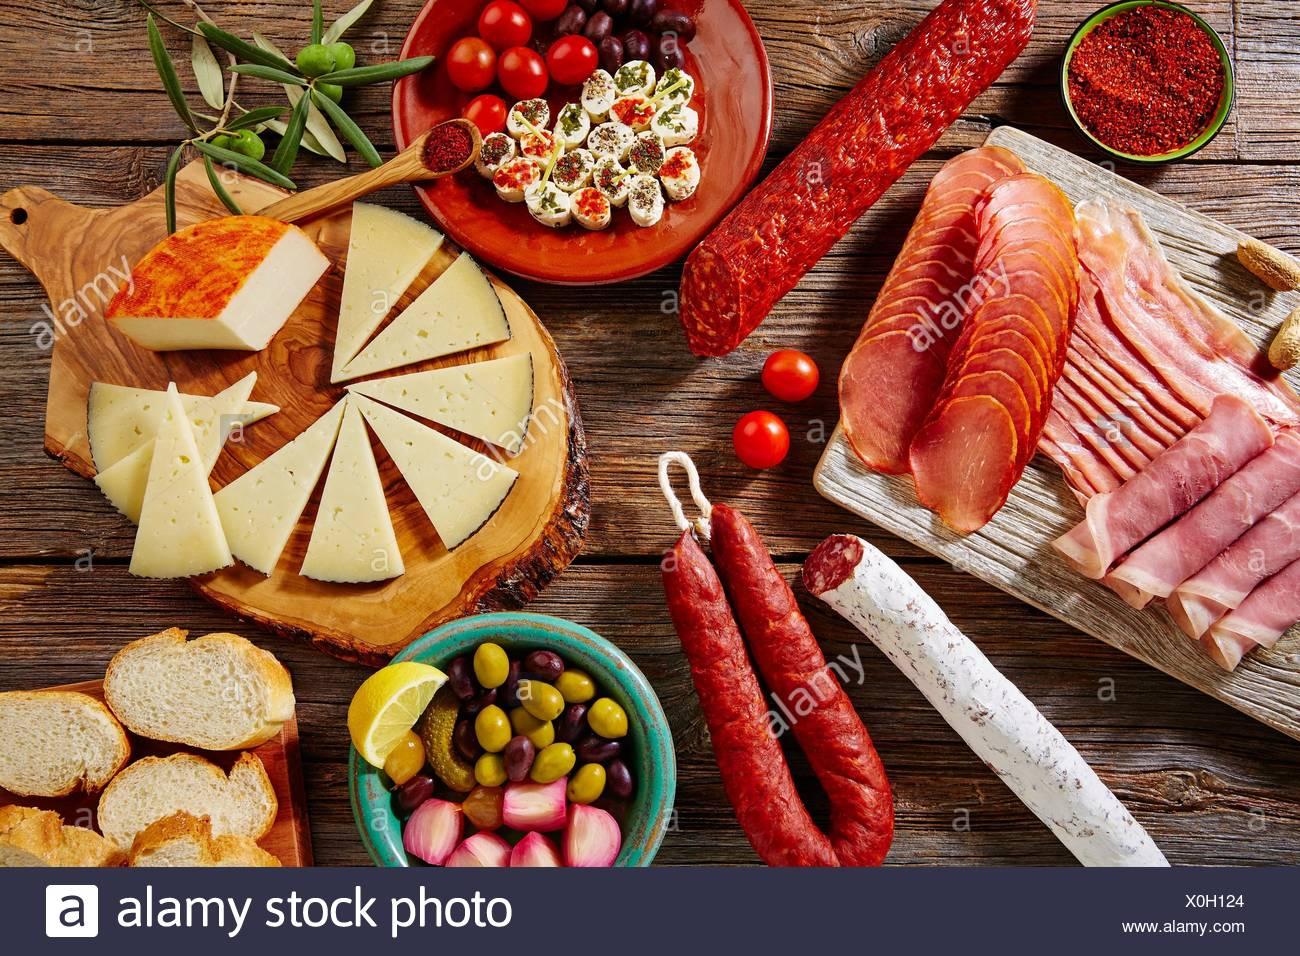 Tapas sausage mix from Spain jamon iberico lomo cheese ham chorizo olives. - Stock Image